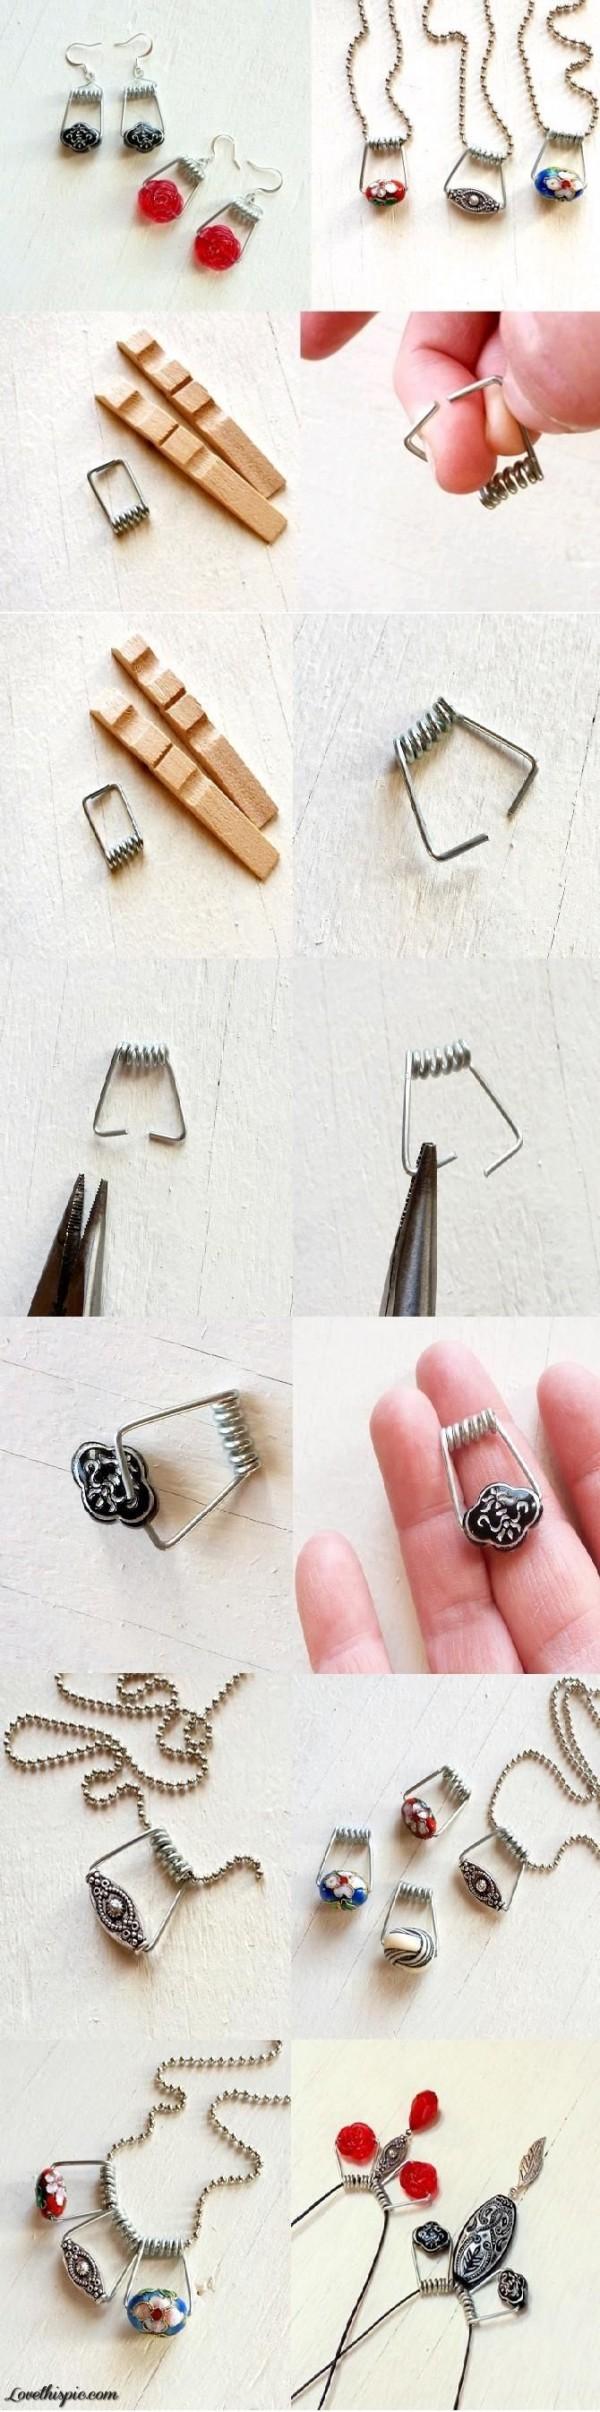 clothespins13